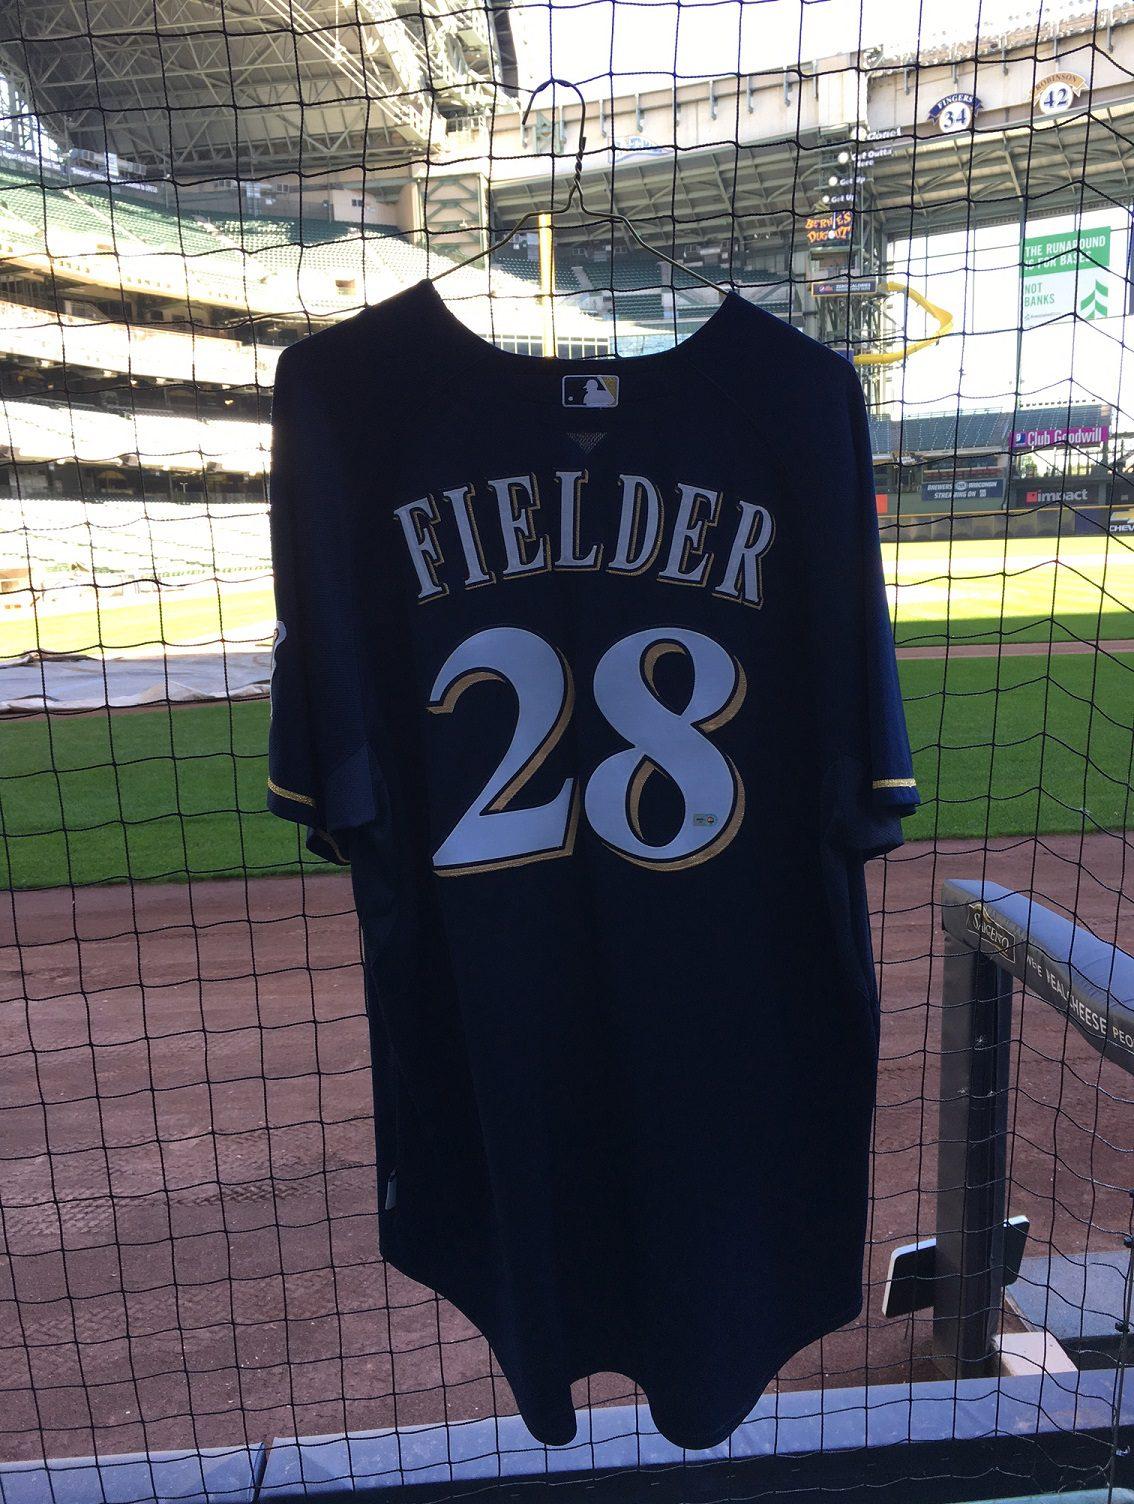 Fielder1-e1477499048128